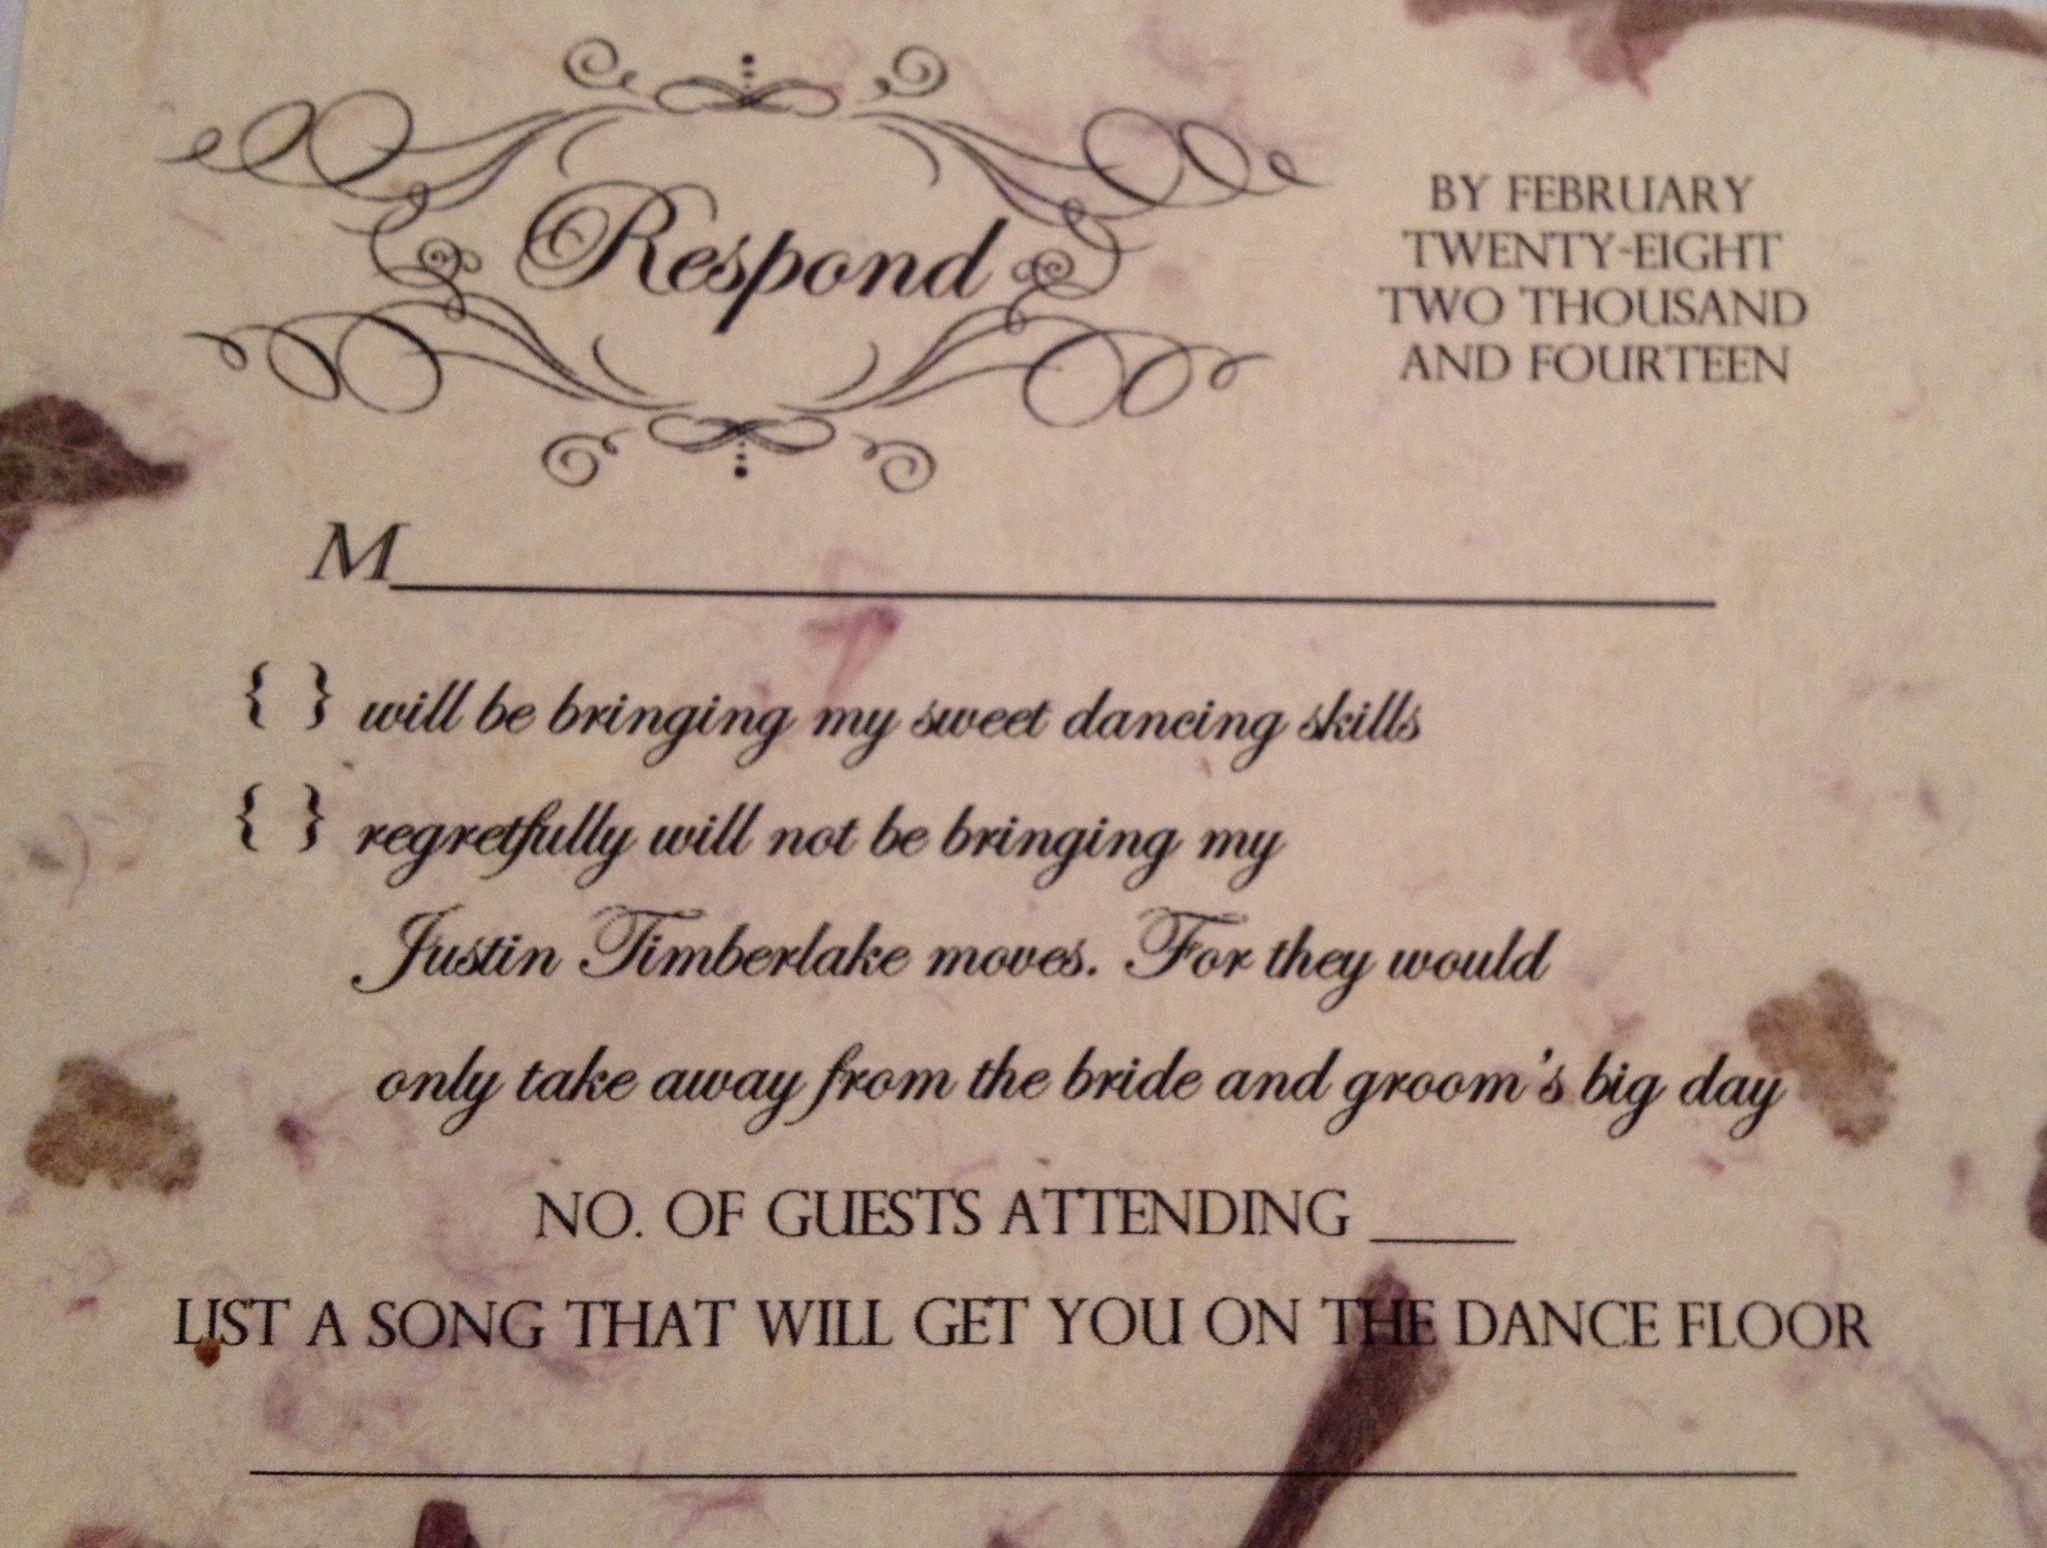 Startling Something Response Ny Wedding Rsvp Took A Week To Think Ny Wedding Rsvp Took A Week To Think Something Wedding Rsvp Cards M Wedding Rsvp Cards Samples